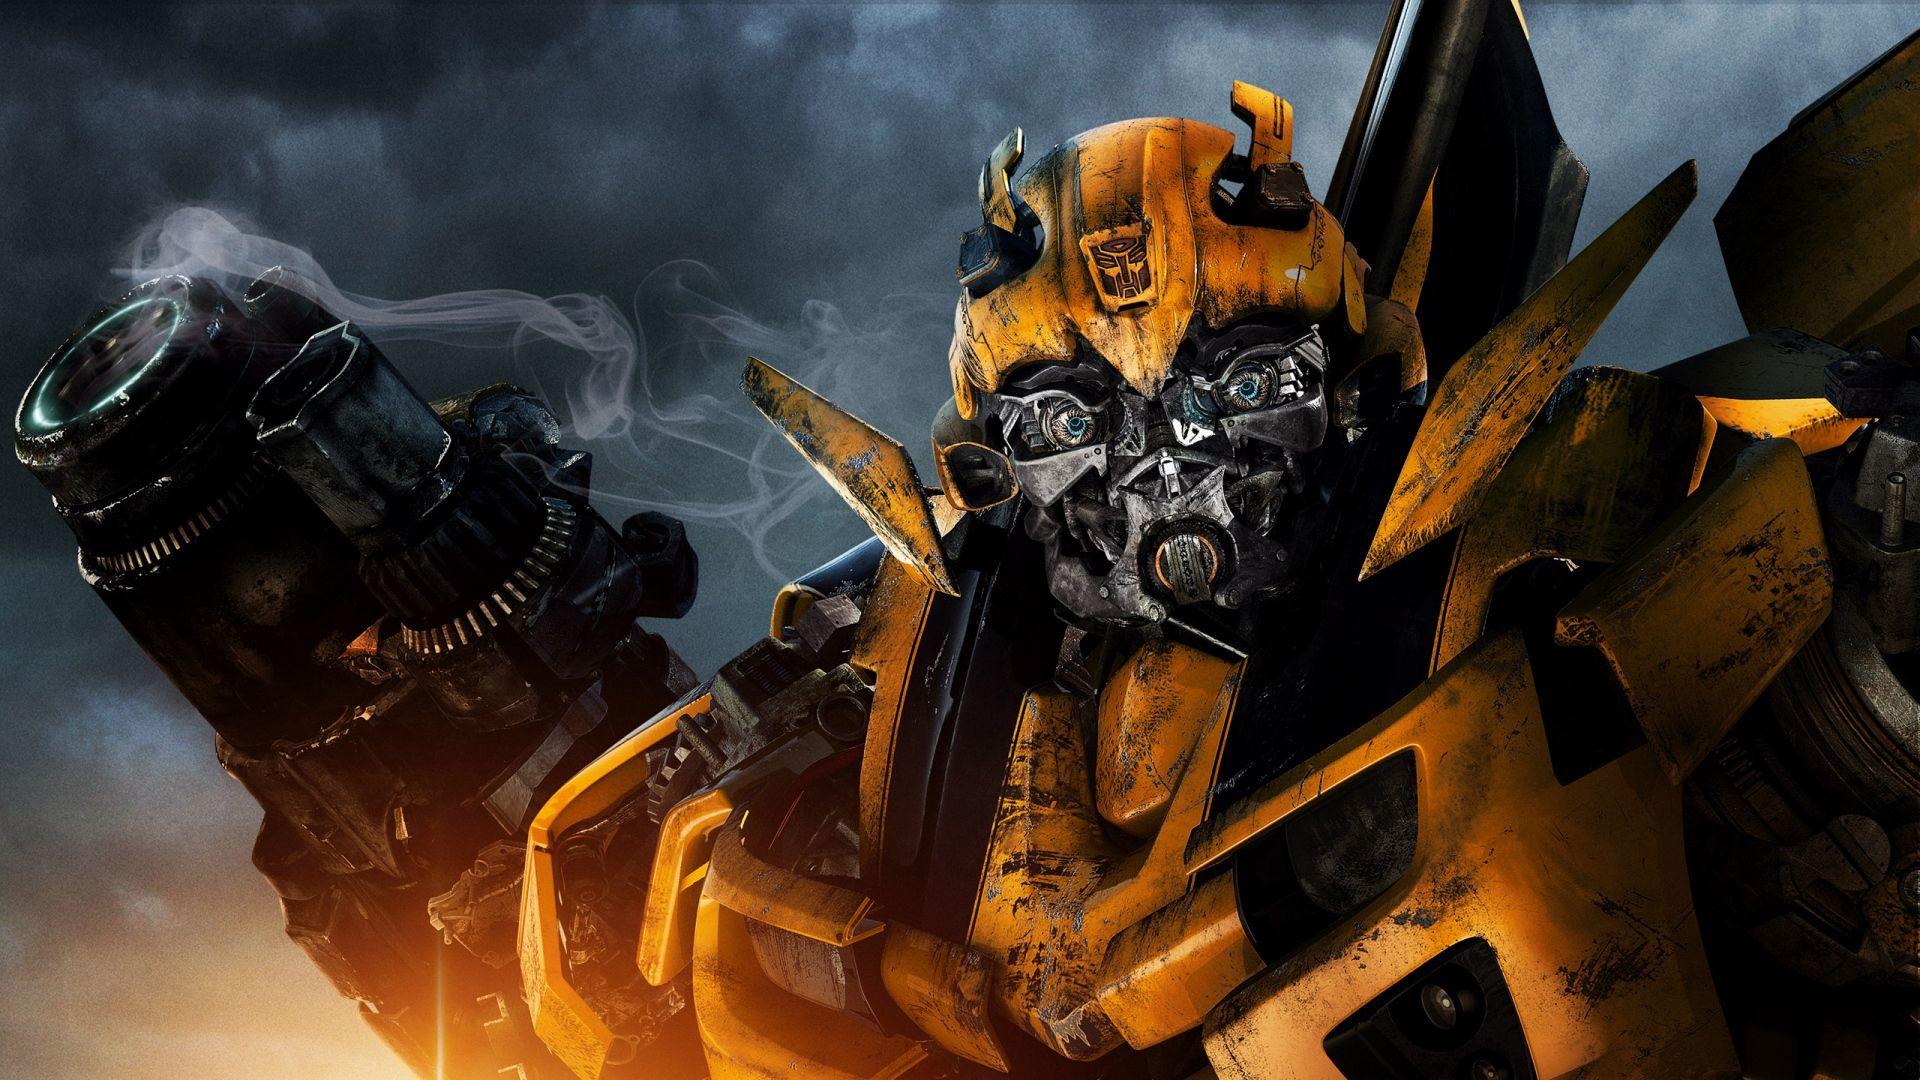 1920x1080 Wallpaper Transformers Bumblebee Robot